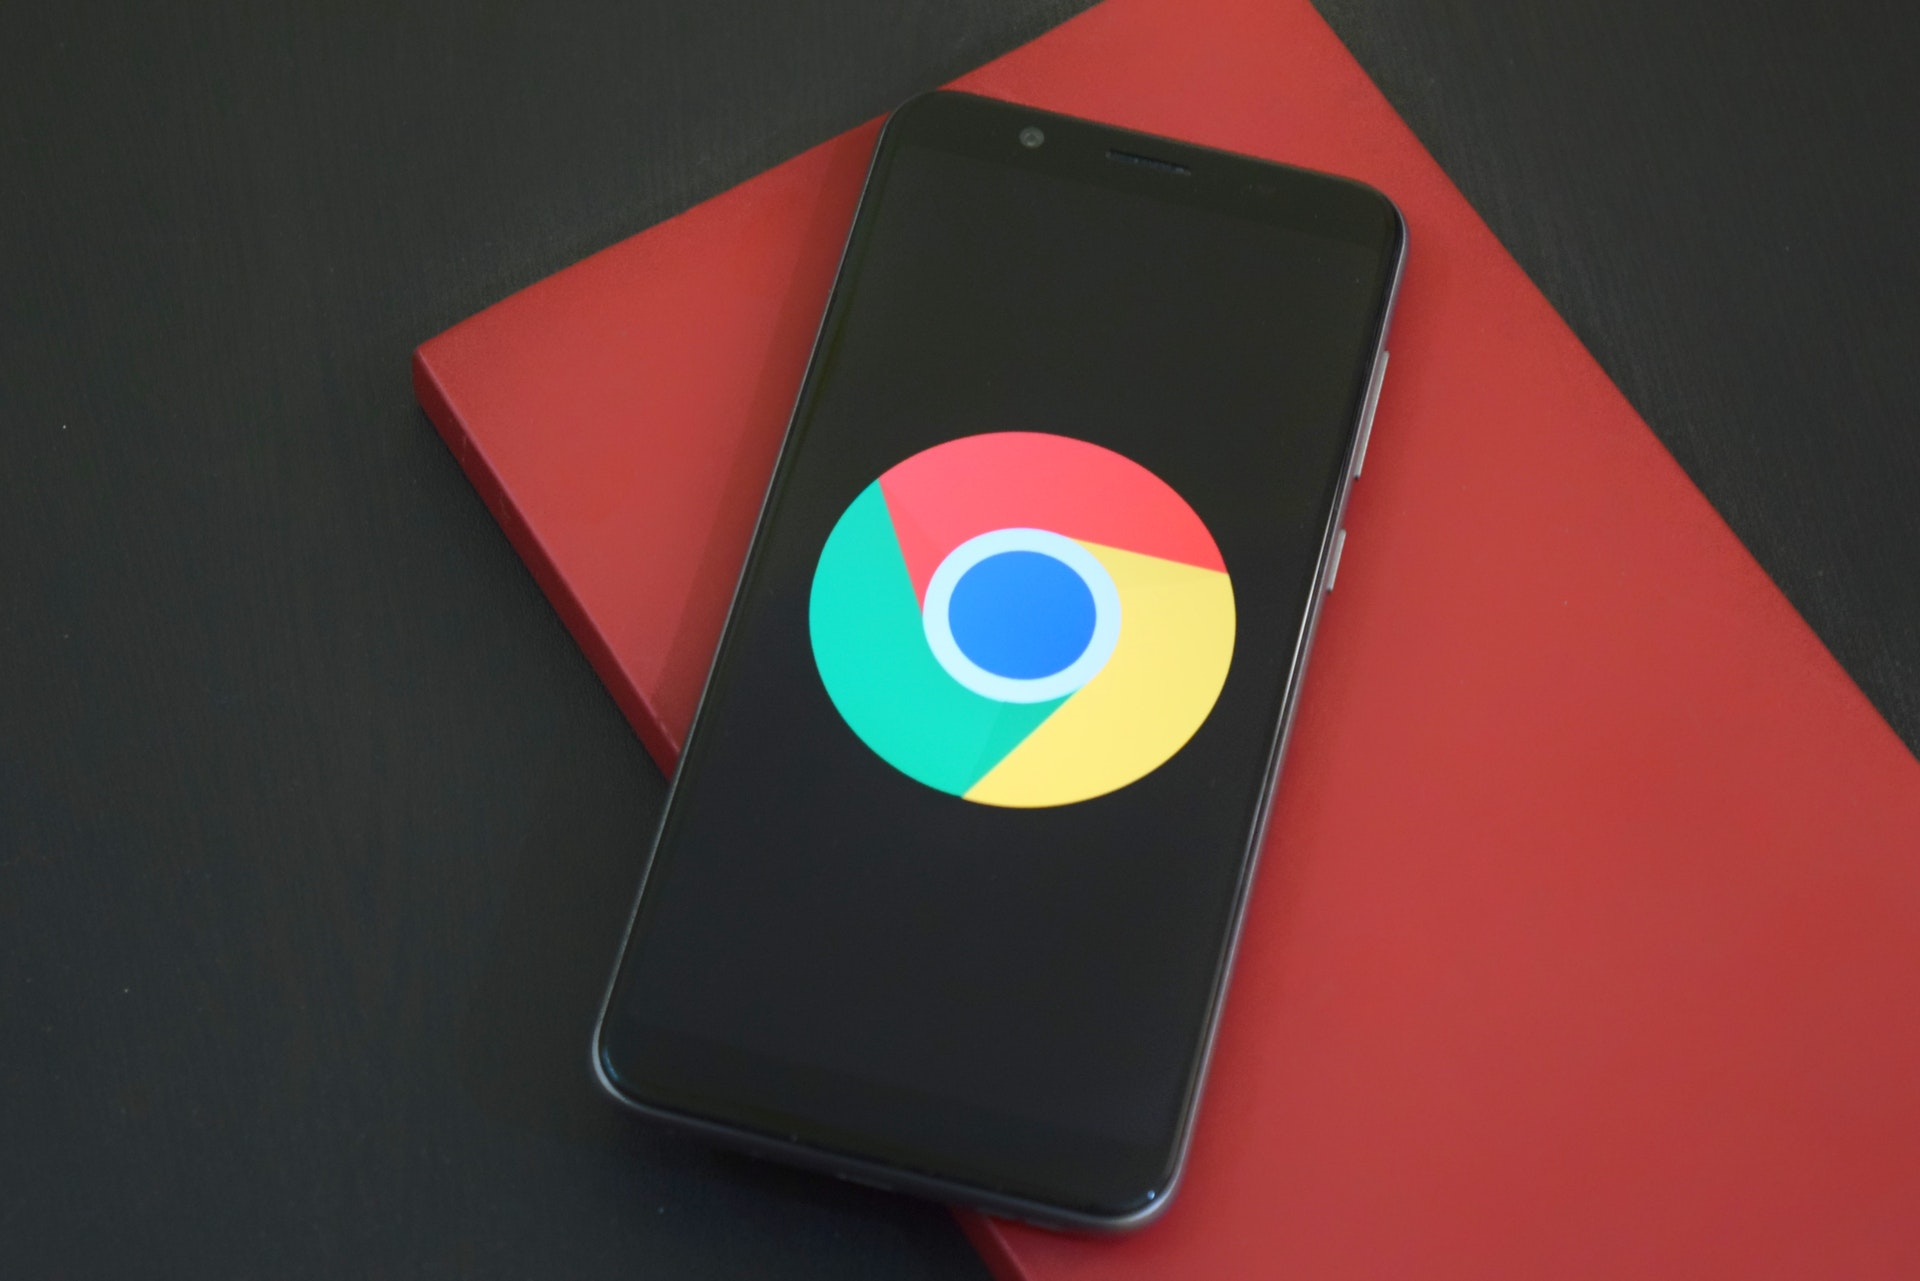 Google Chromeの新しい機能「リーディングリスト」の有効・無効を切り替える方法